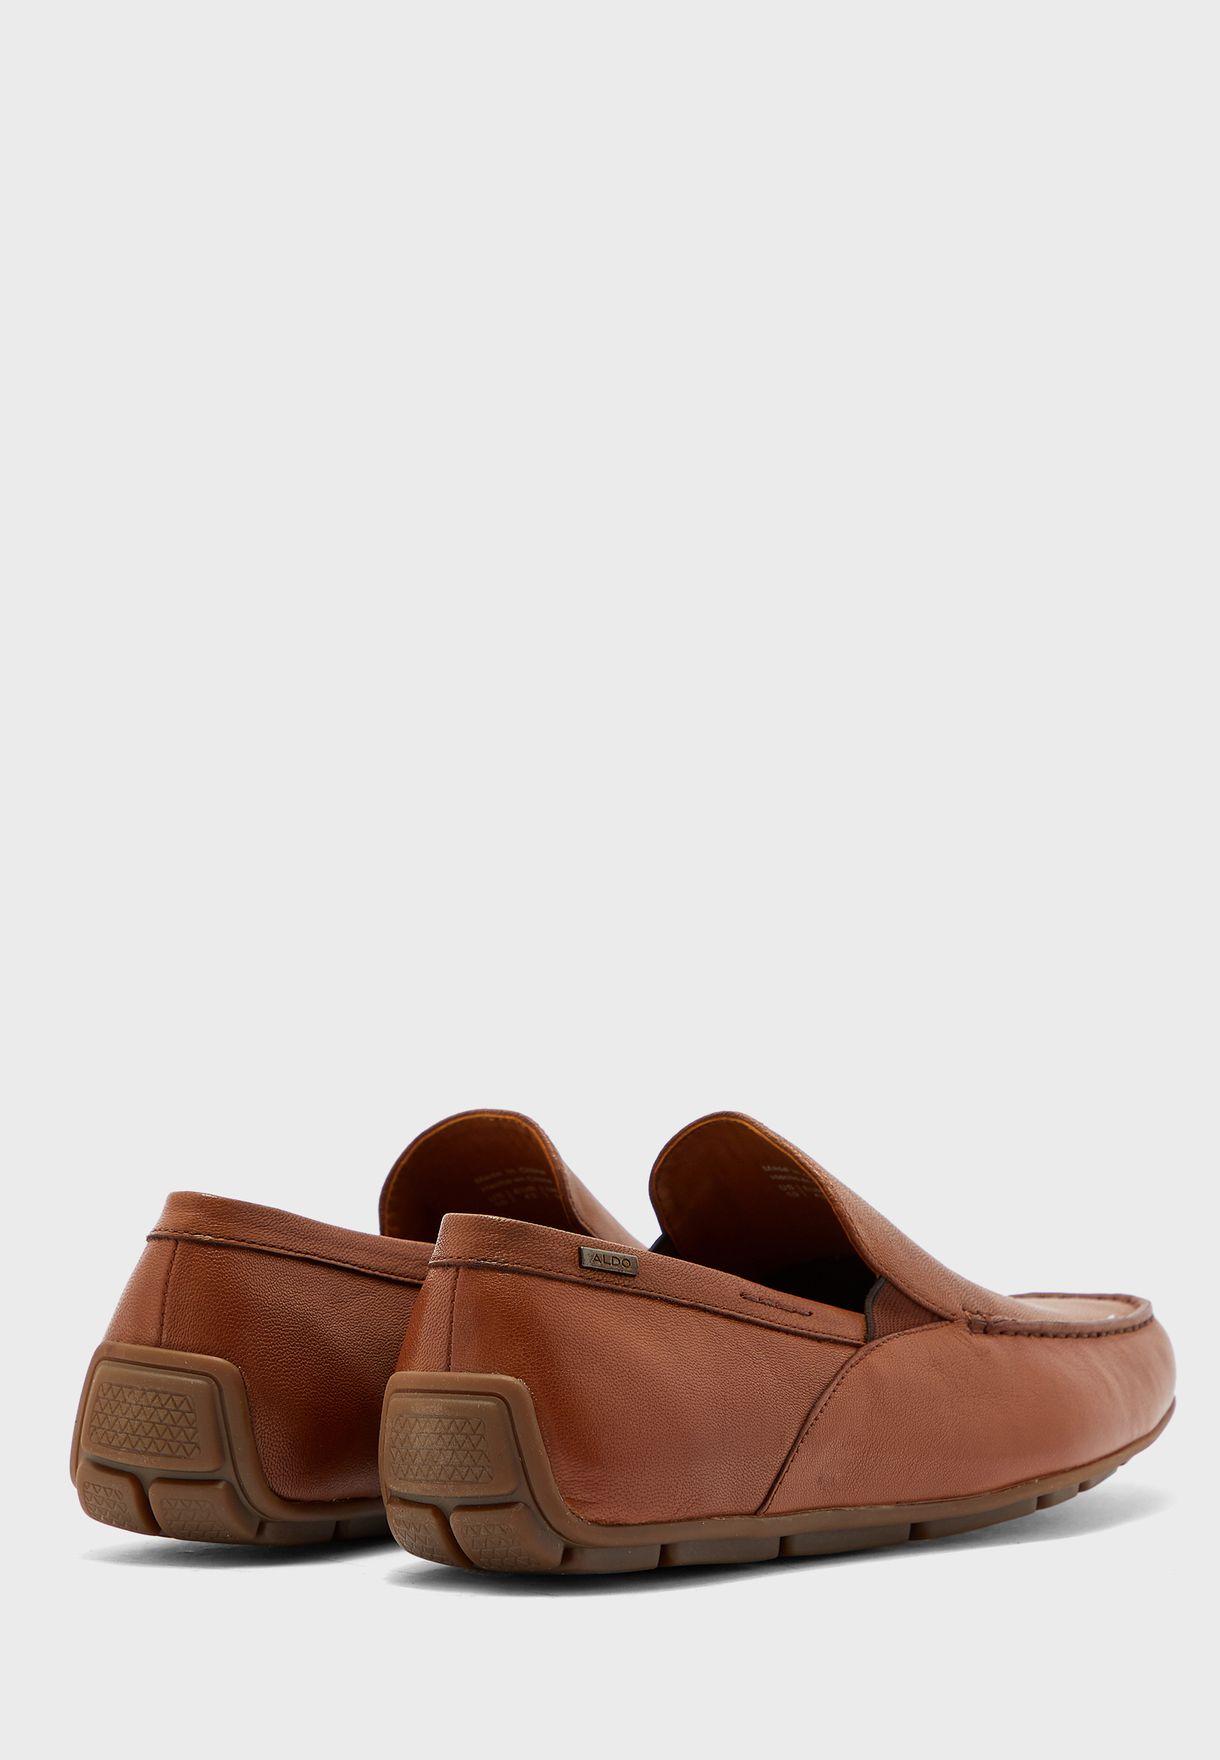 حذاء موكاسين عصري